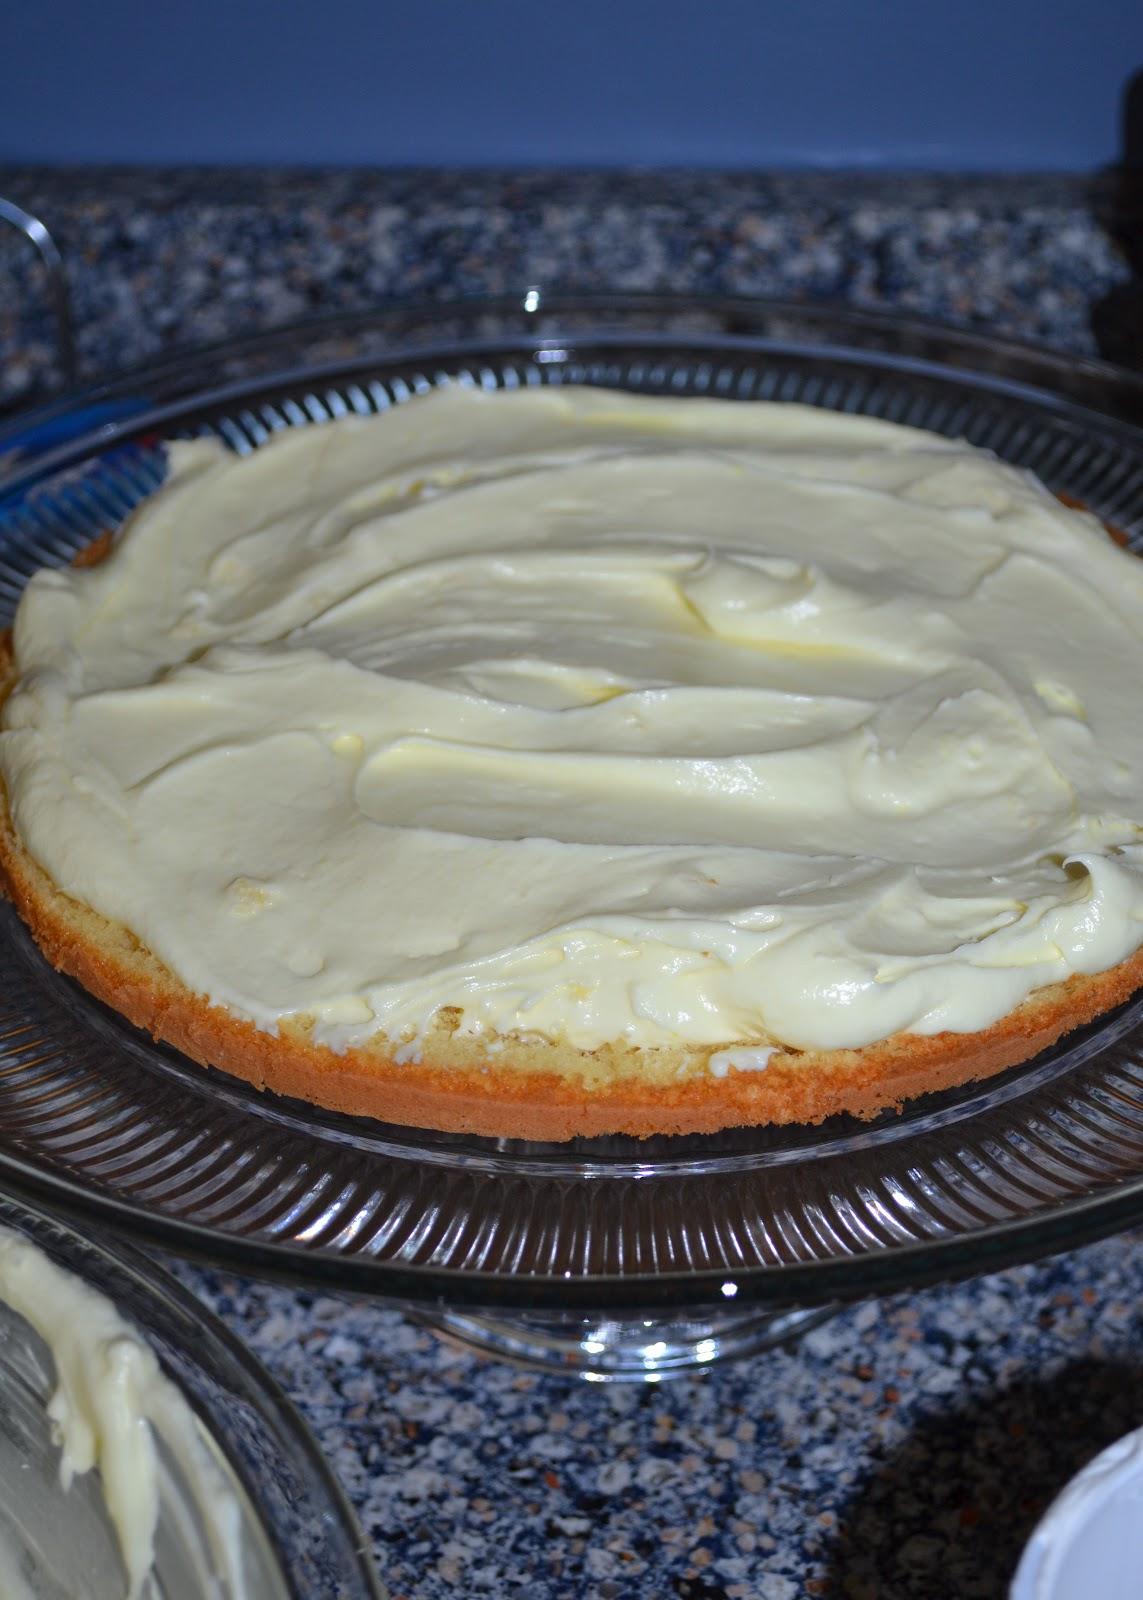 The Domestic Doozie Strawberry Lemonade Cake